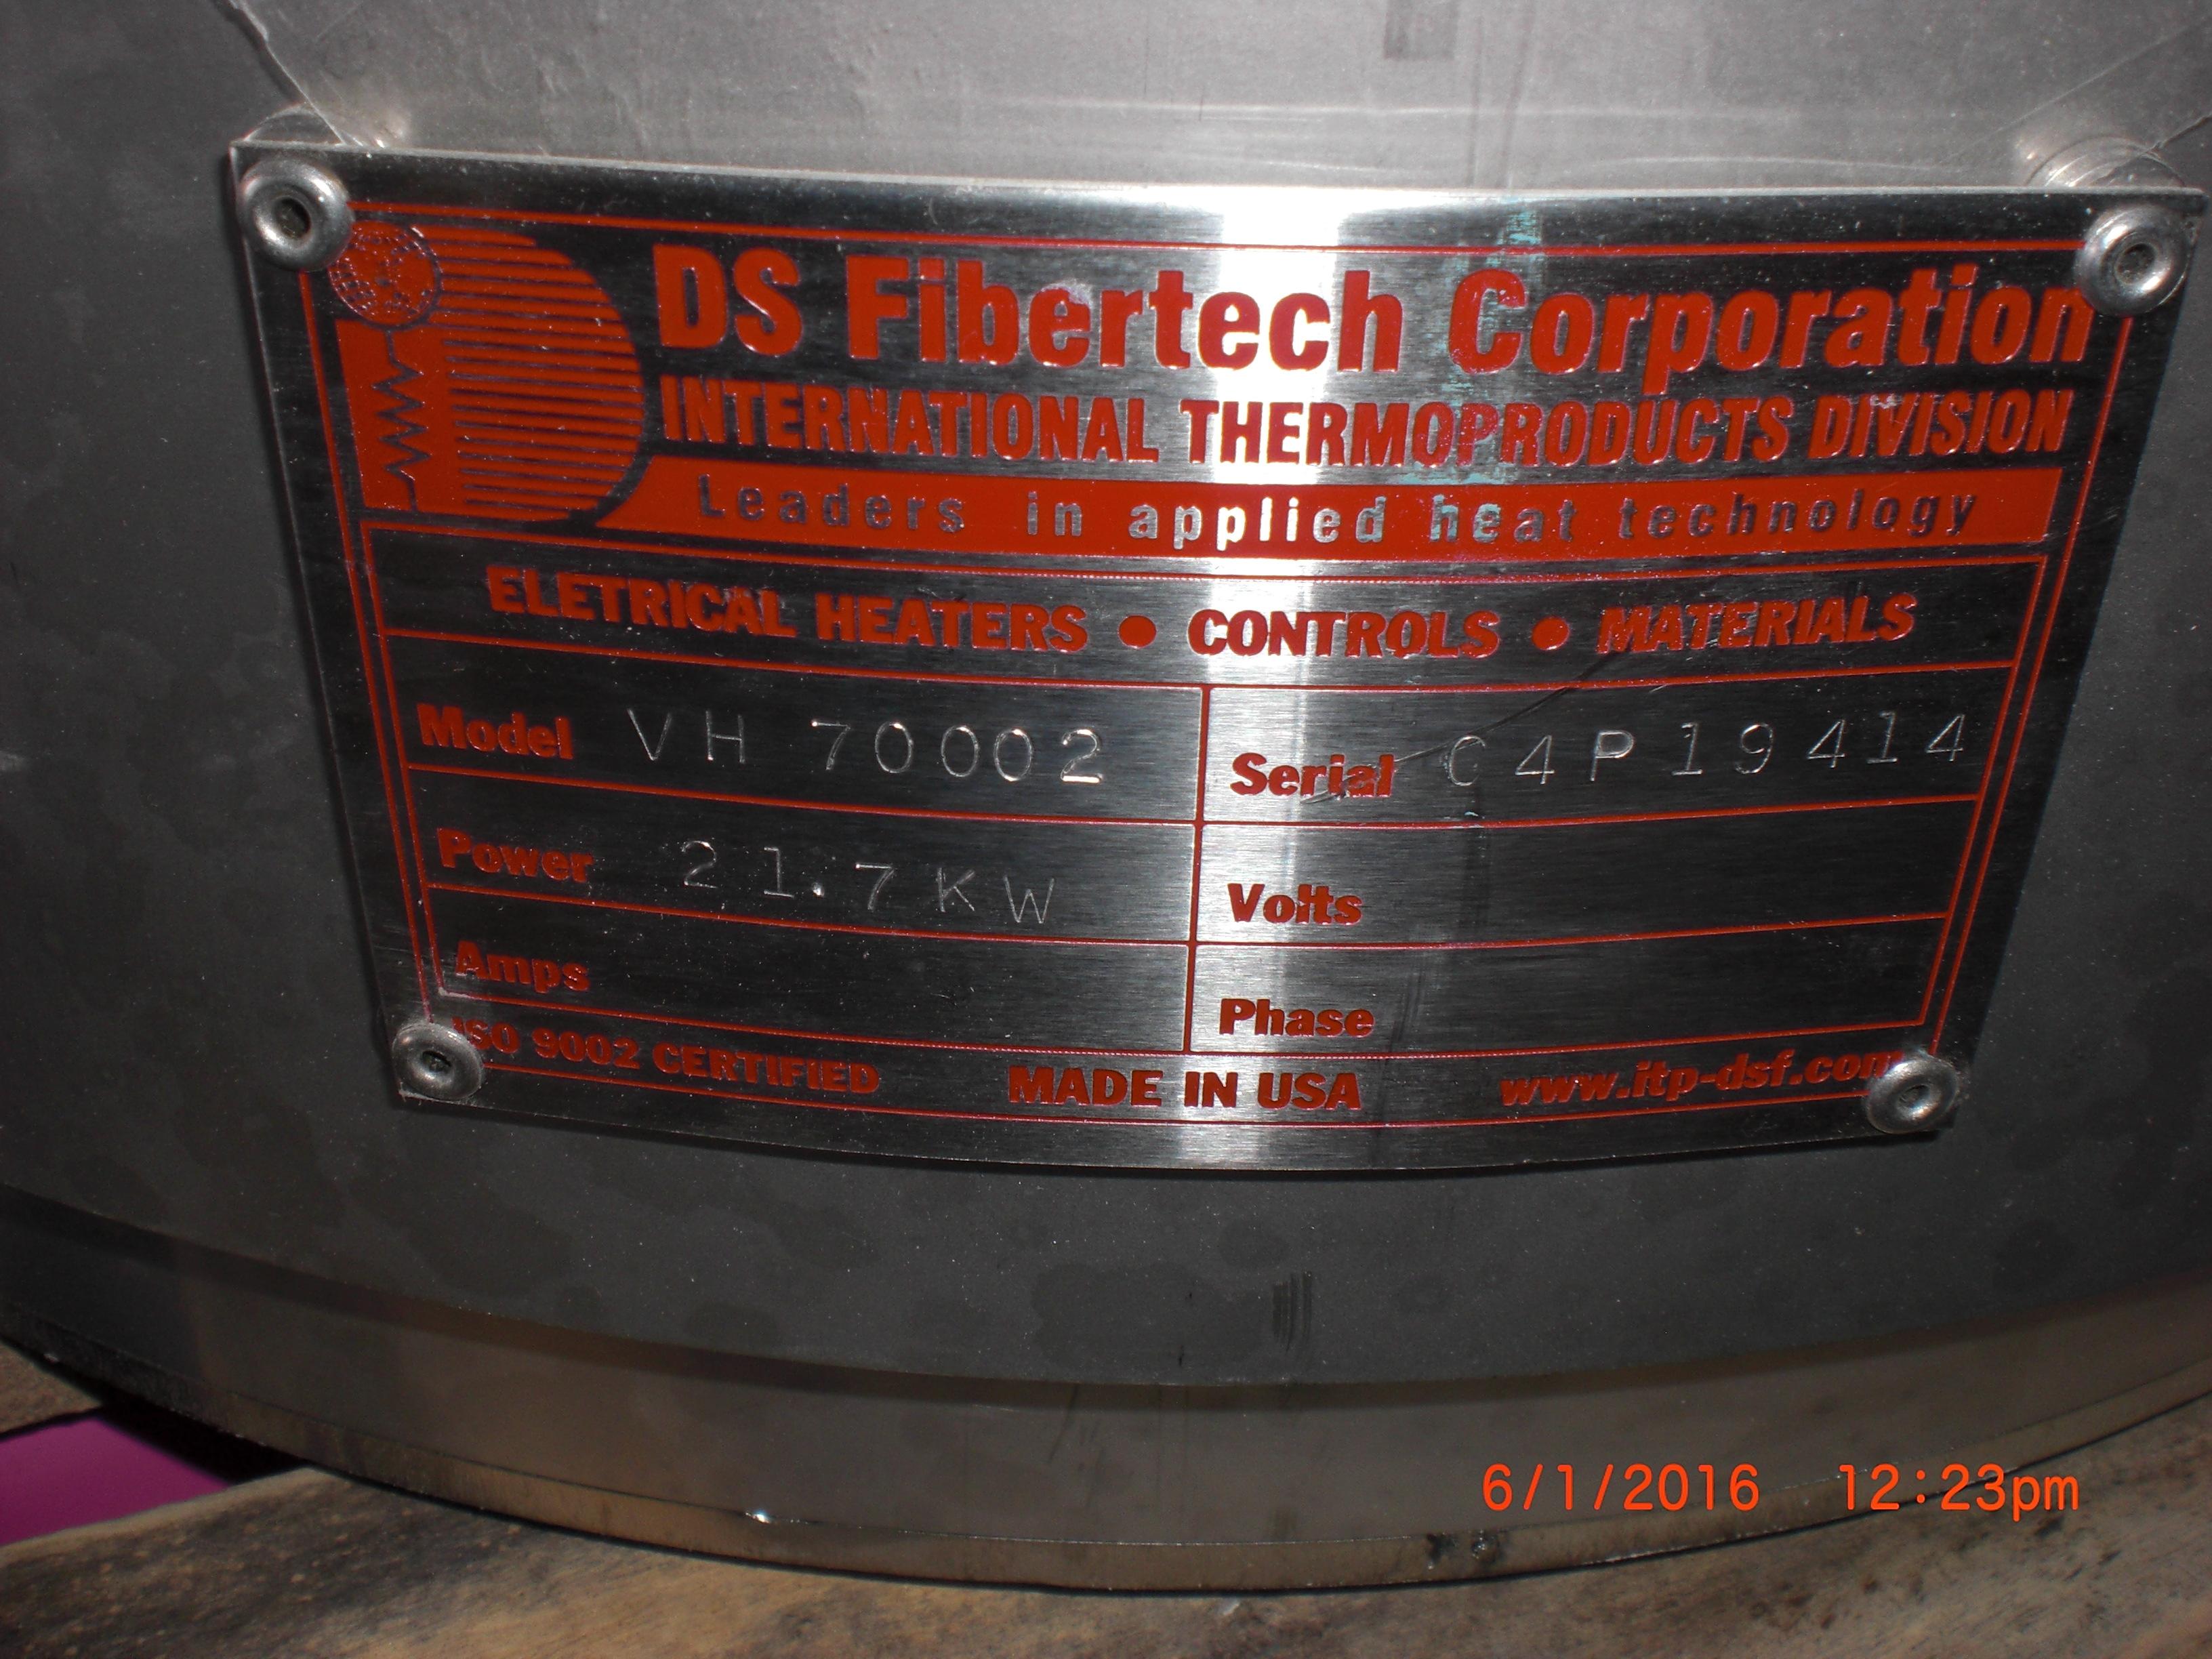 Heater SVG Thermco VTR7000 Furnace element 21.7 Kw  DS Fibertech VH 70002